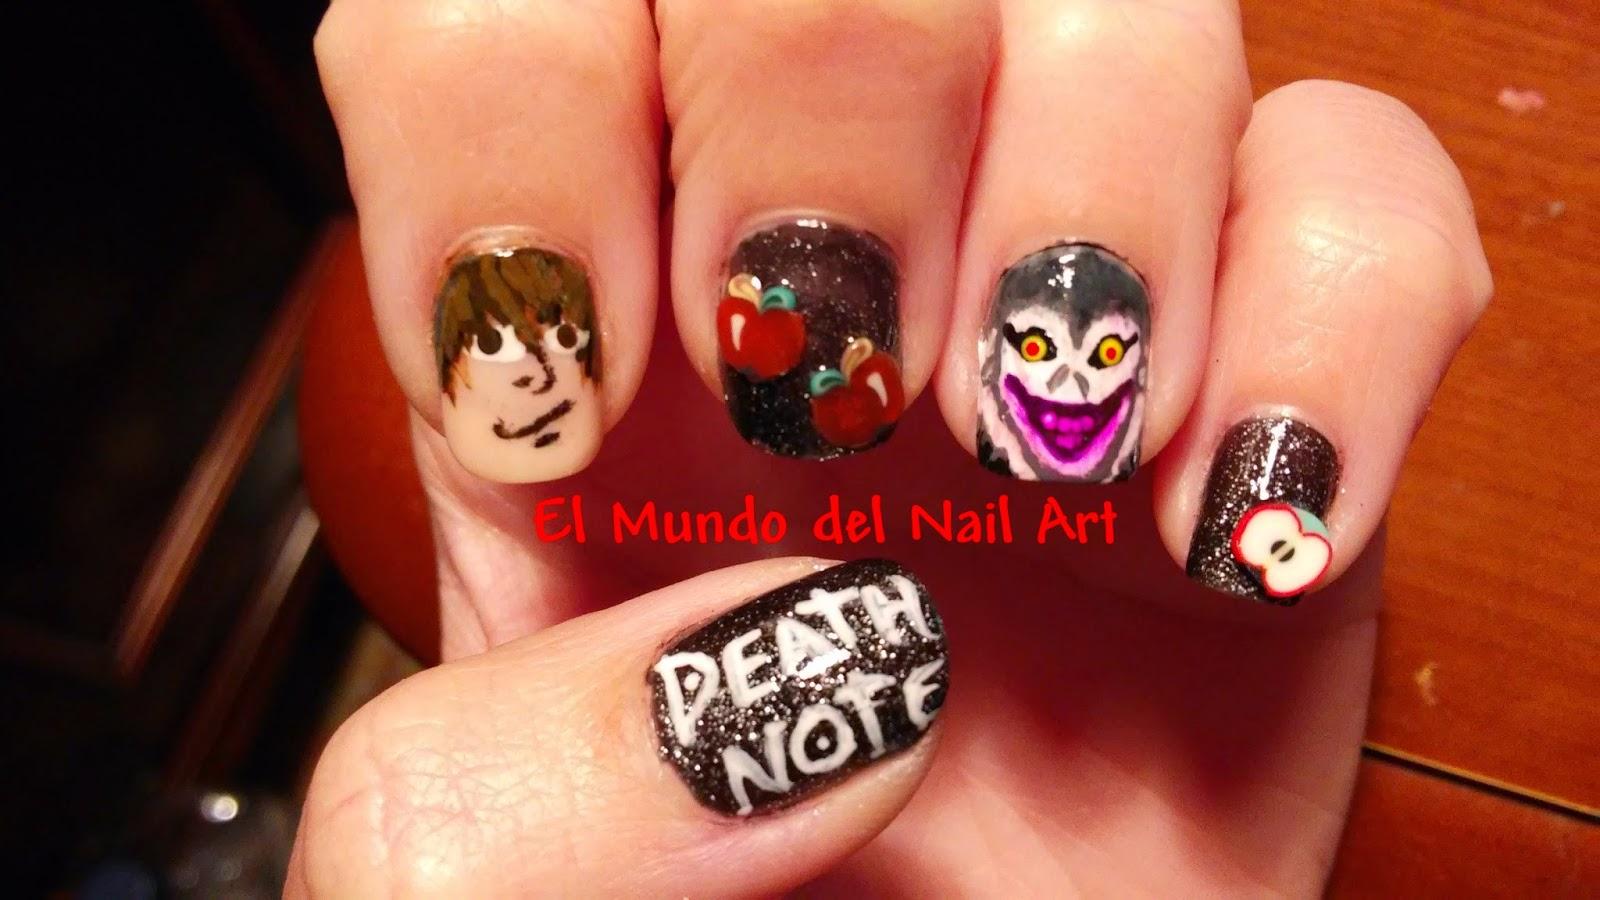 El Mundo del Nail Art: Manicura: Death Note #RetoFRIKI2015